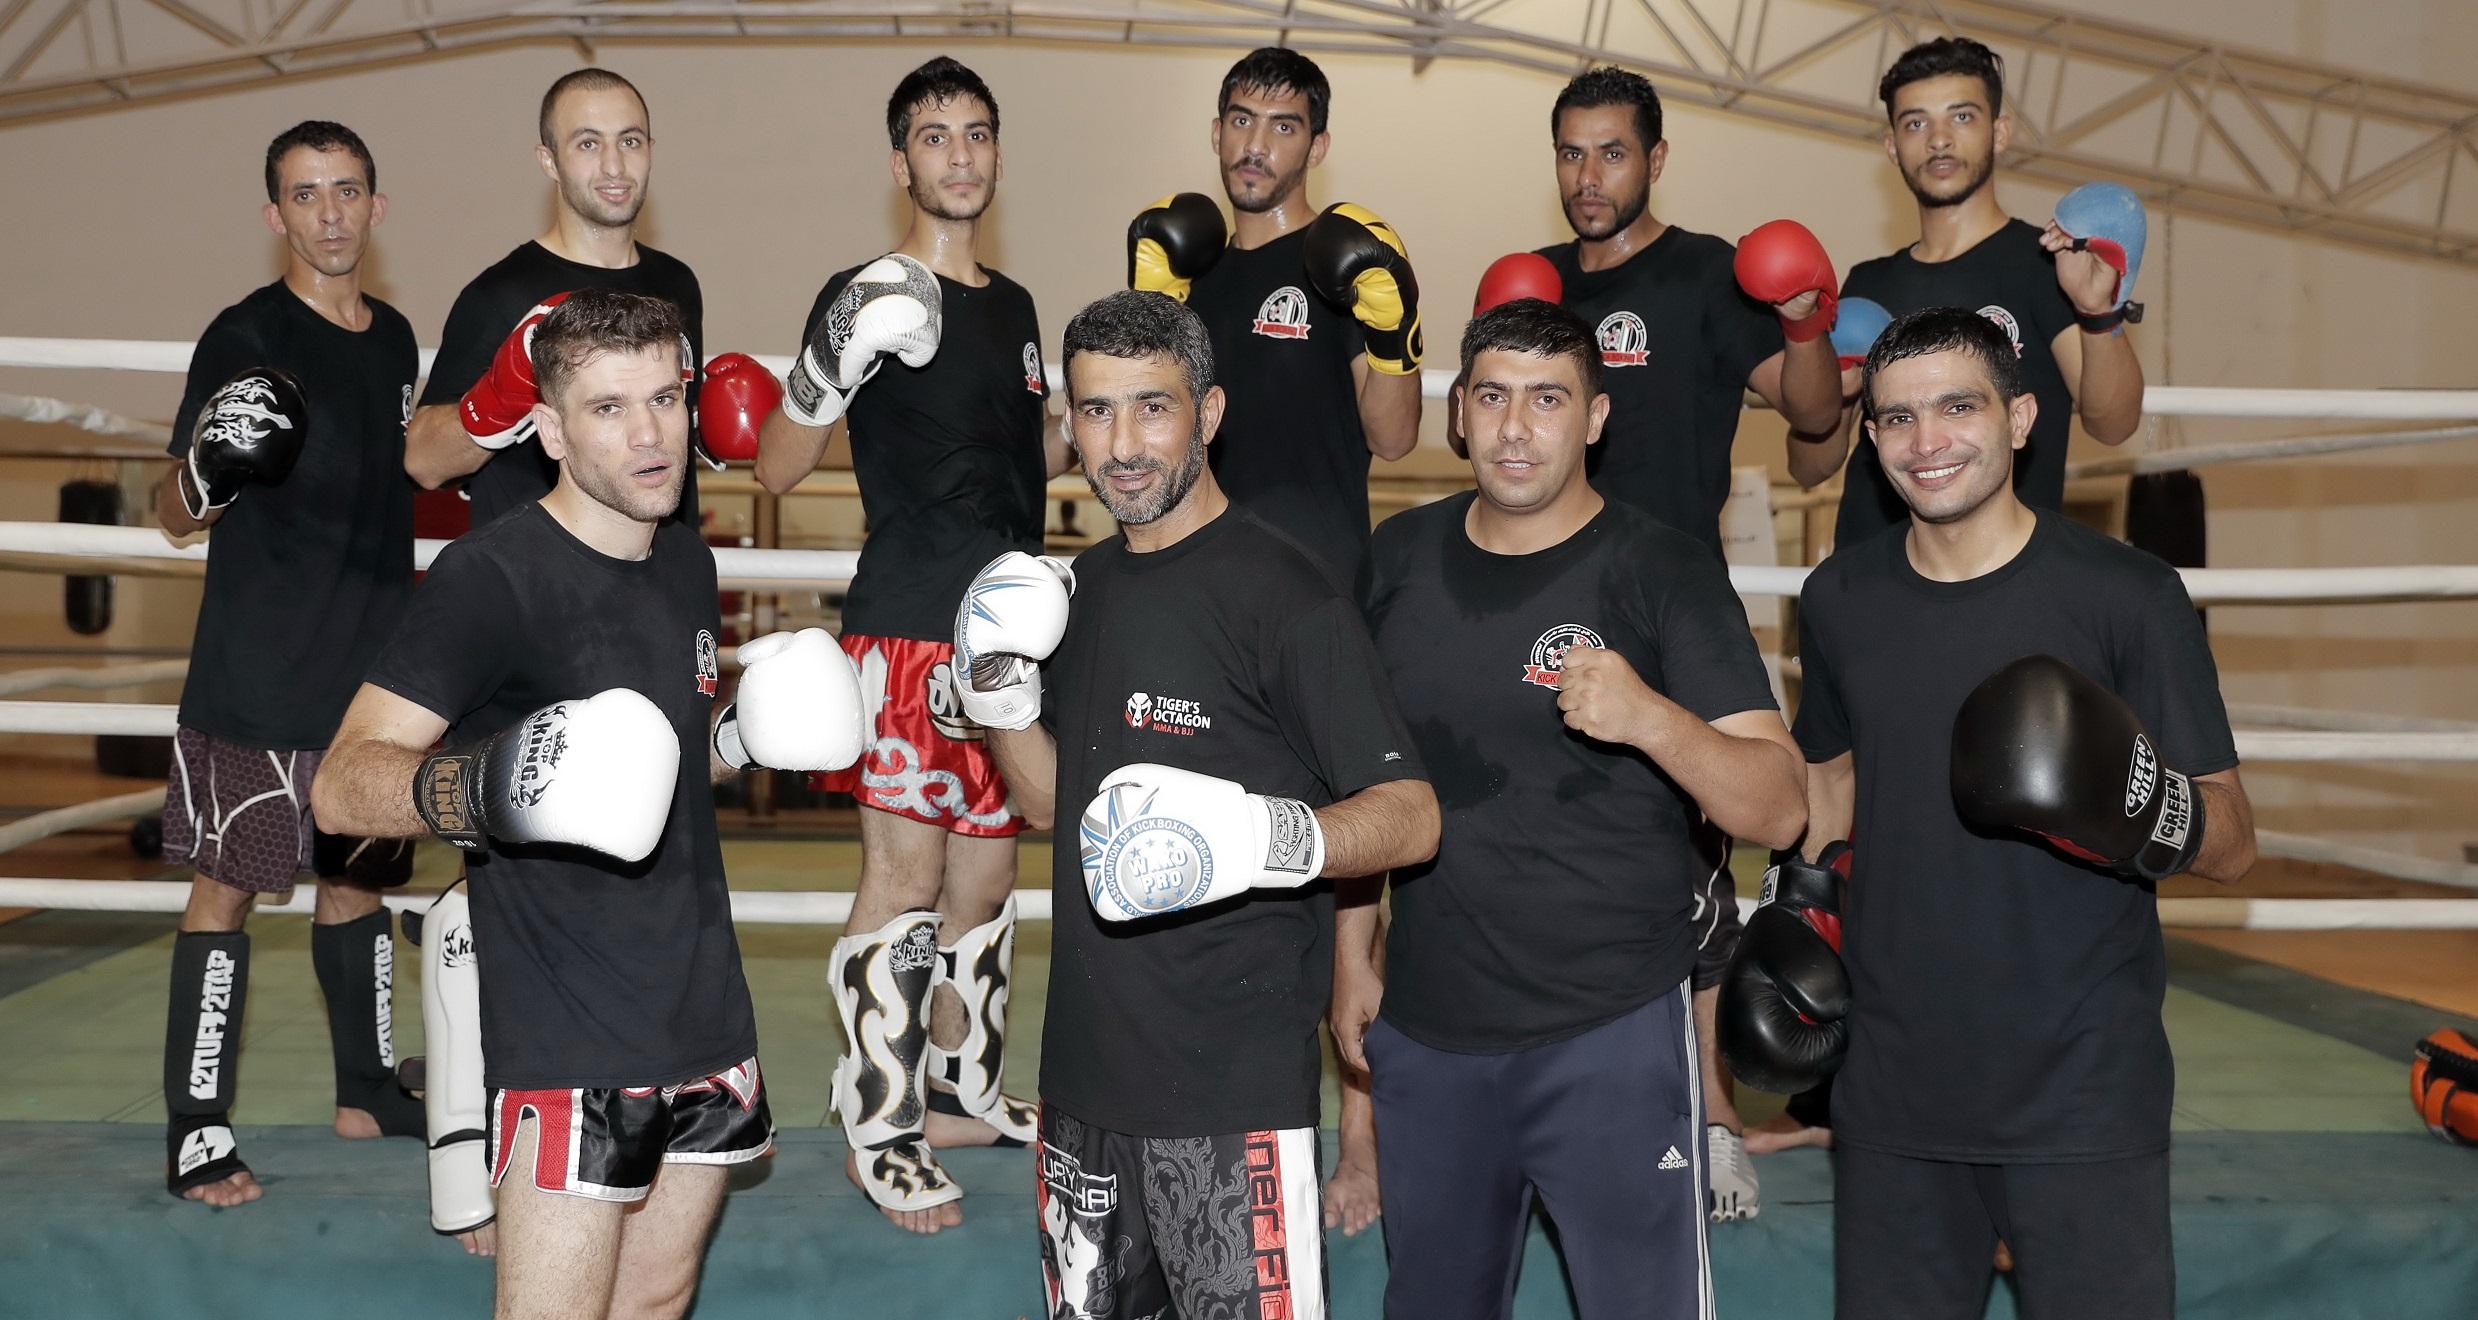 KICKBOXERS AIM FOR ASIAN INDOOR GAMES MEDALS - Jordan Olympic Committee